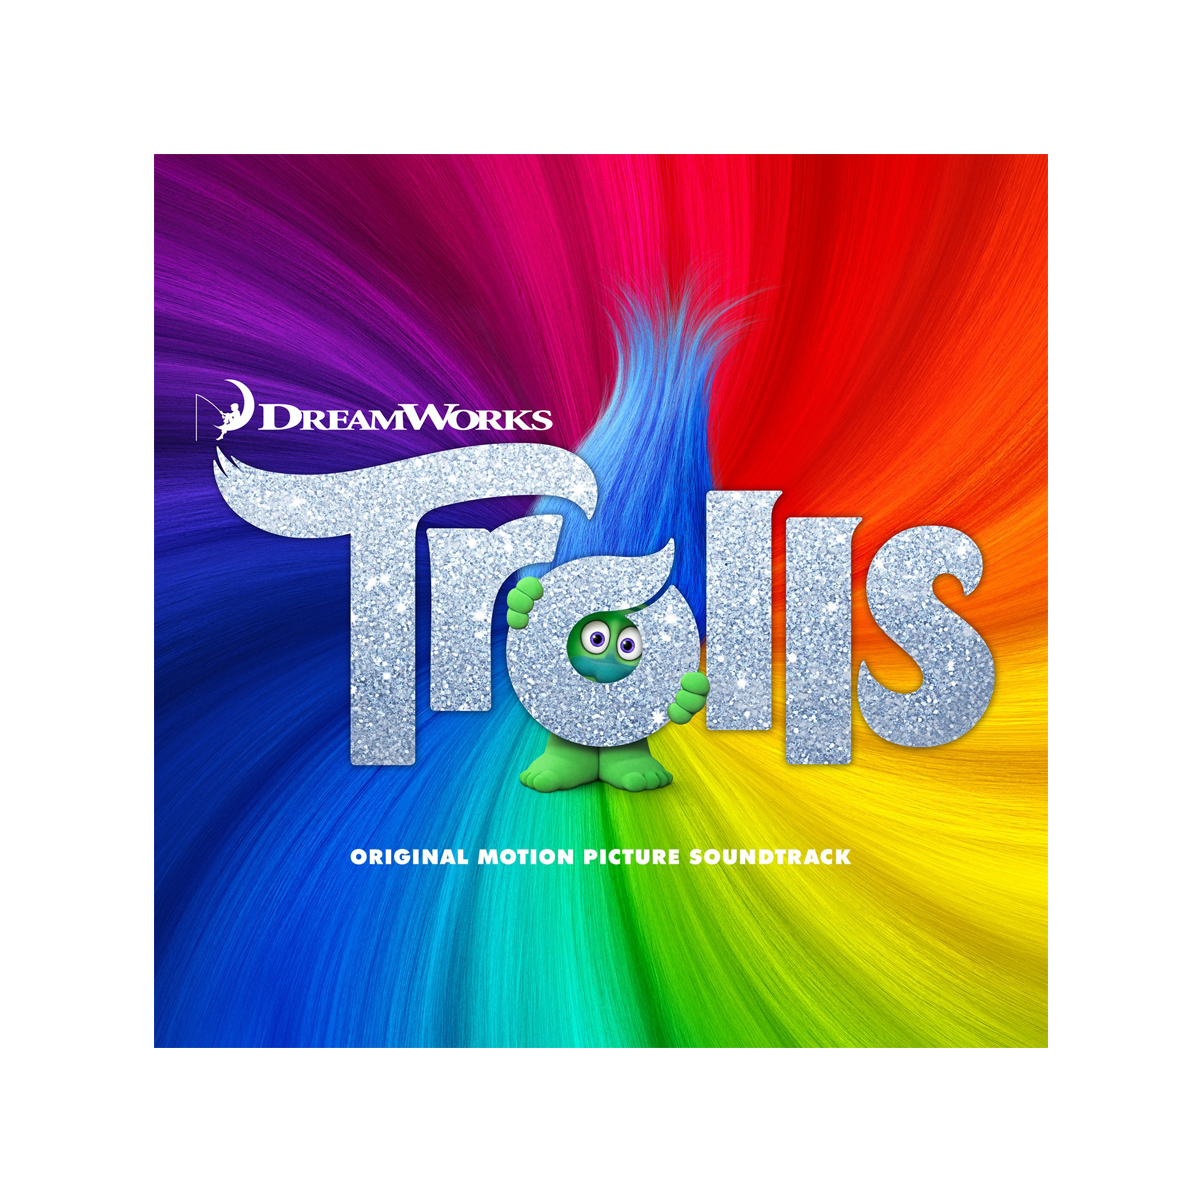 Trolls (Original Motion Picture Soundtrack) - MP3 | Shop the DreamWorks Official Store